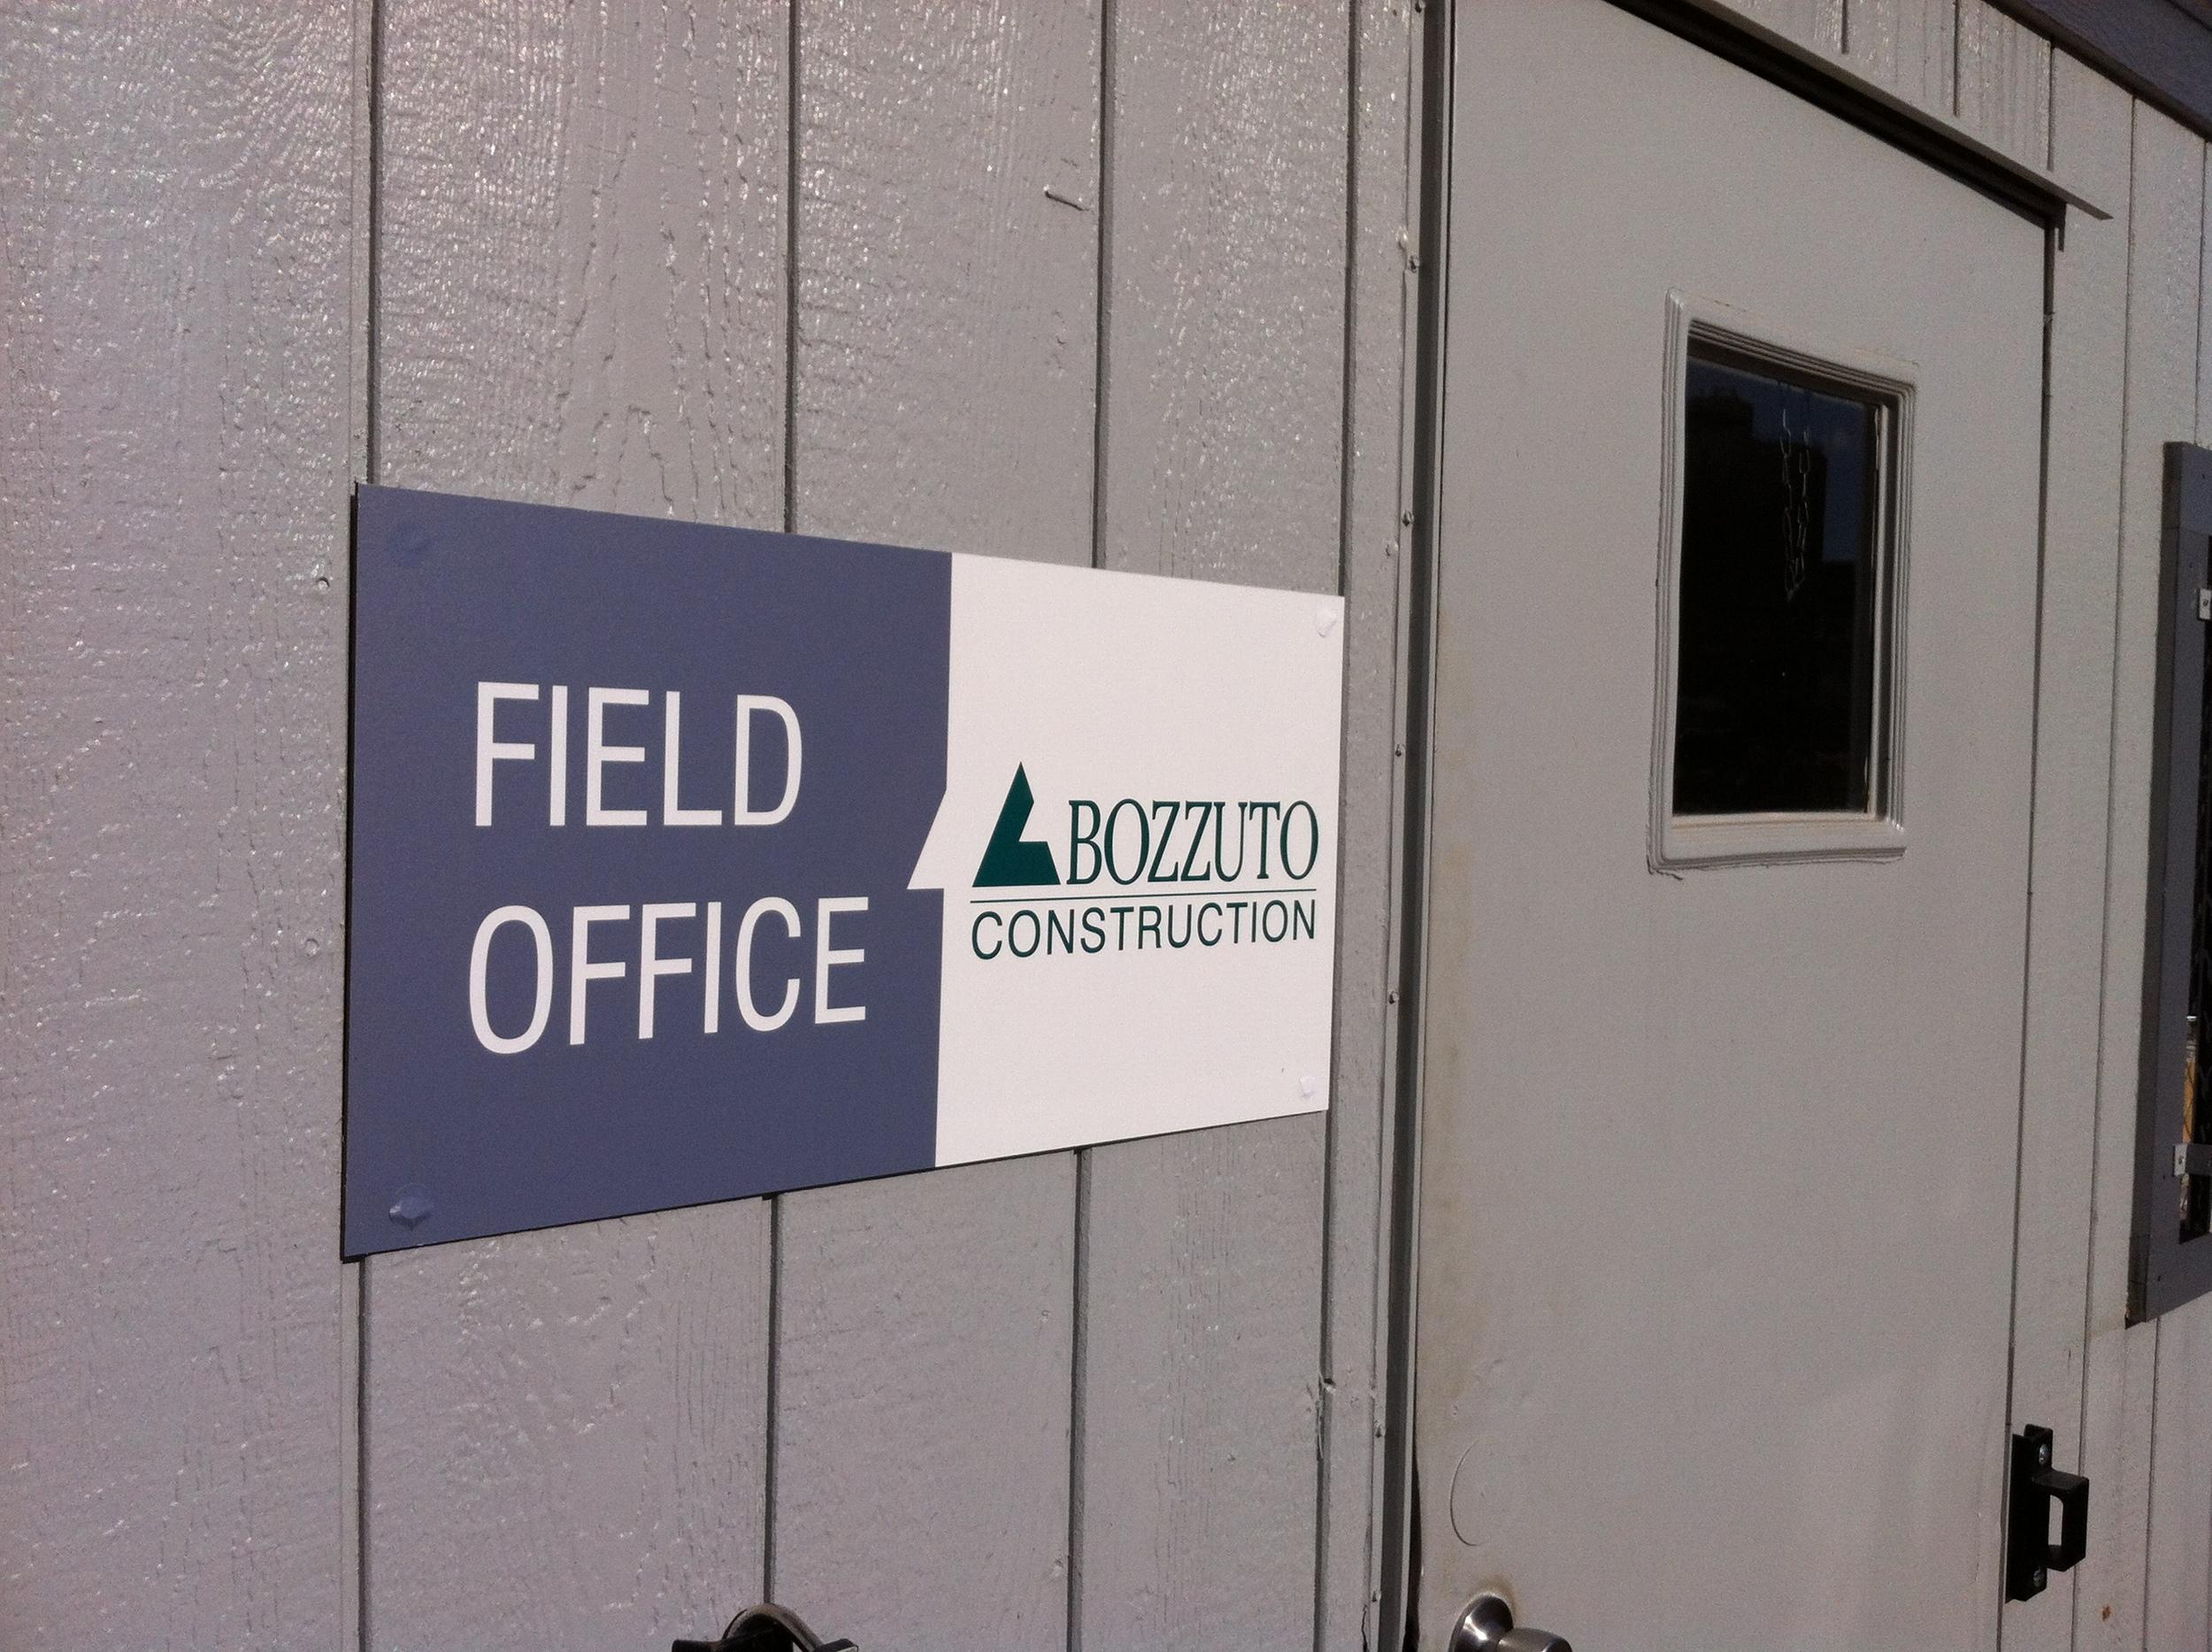 Bozzuto Construction_Petworth Safeway_25921 (5).JPG